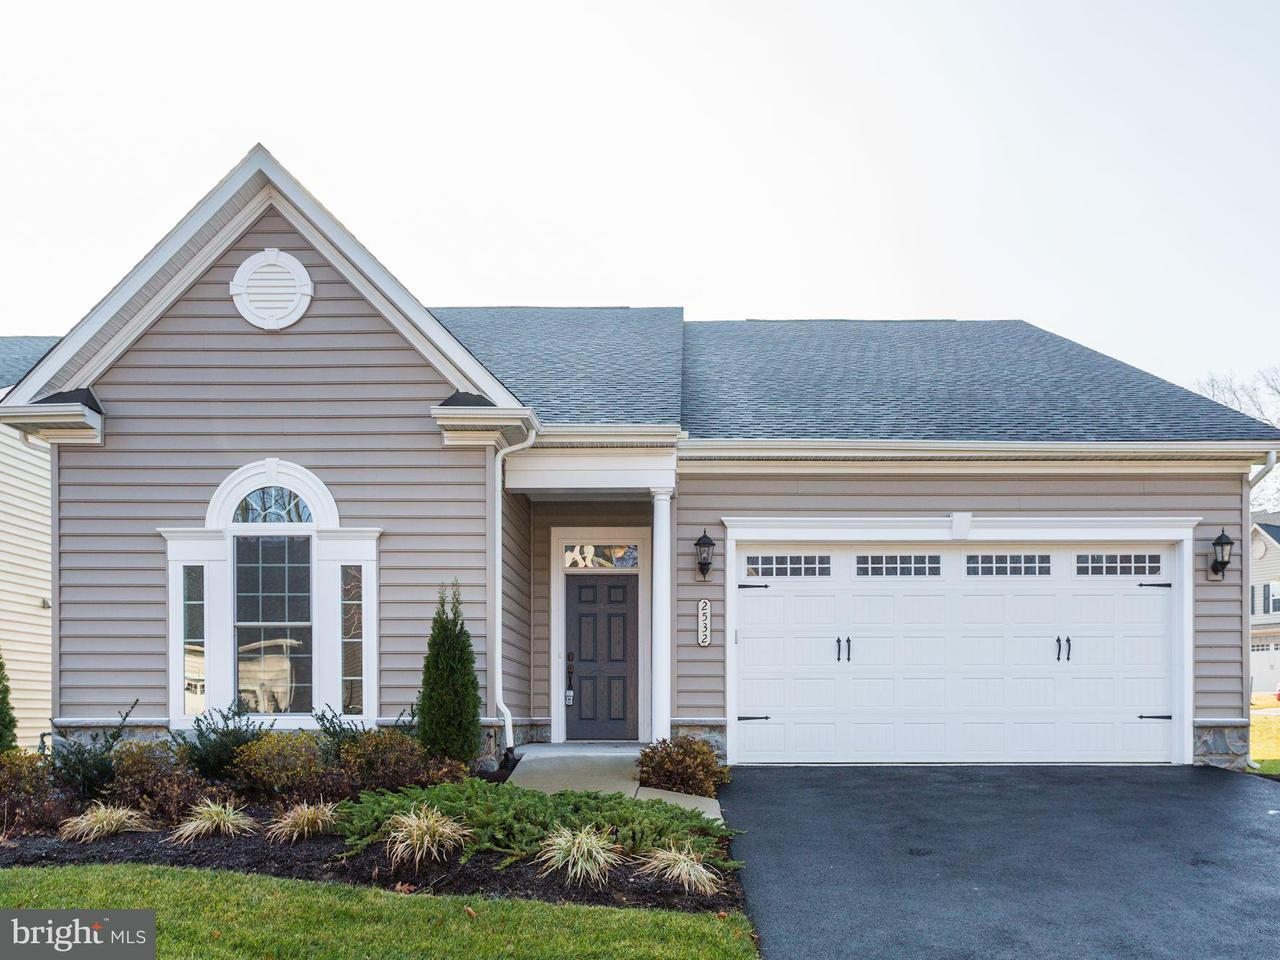 独户住宅 为 销售 在 2532 Sophia Chase Drive 2532 Sophia Chase Drive Marriottsville, 马里兰州 21104 美国